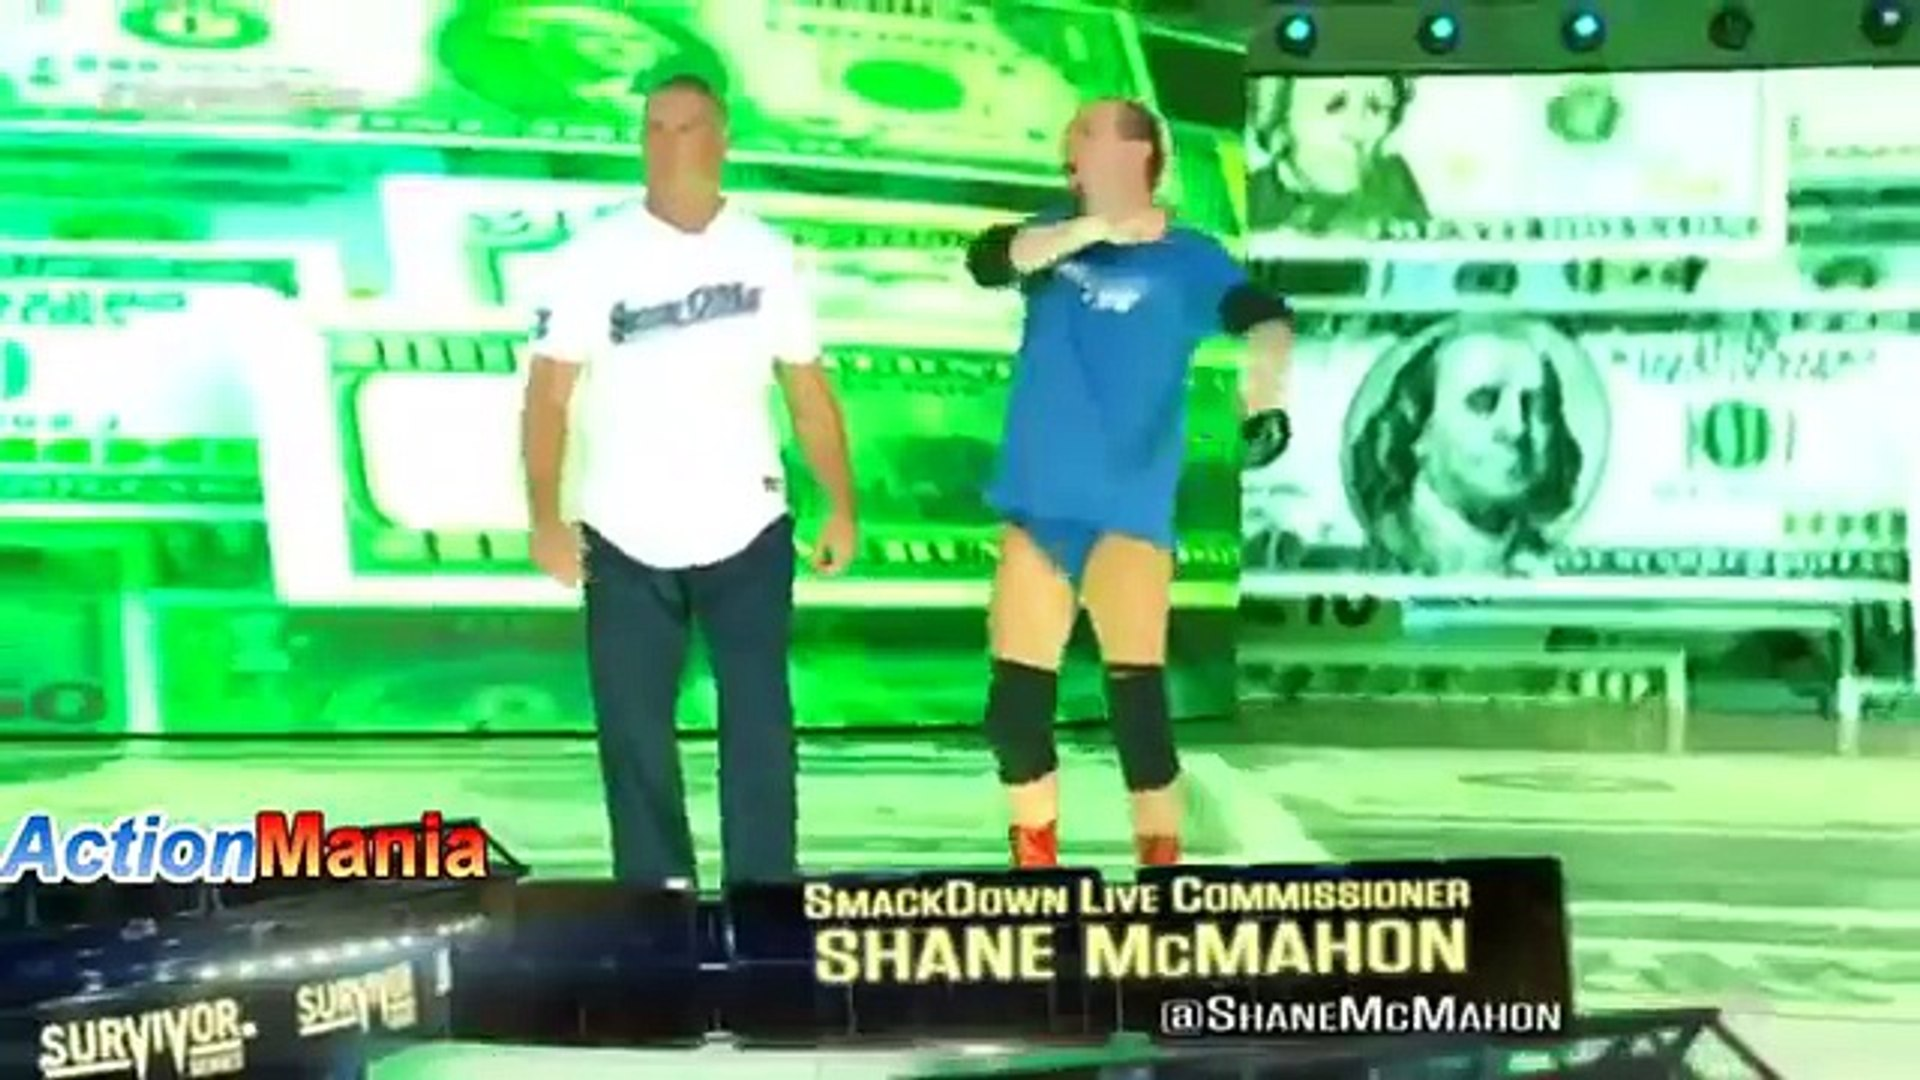 WWE Raw 4 November 2017 - 4-11-2017 - The Shield vs AJ Style at Survivor Series 2017